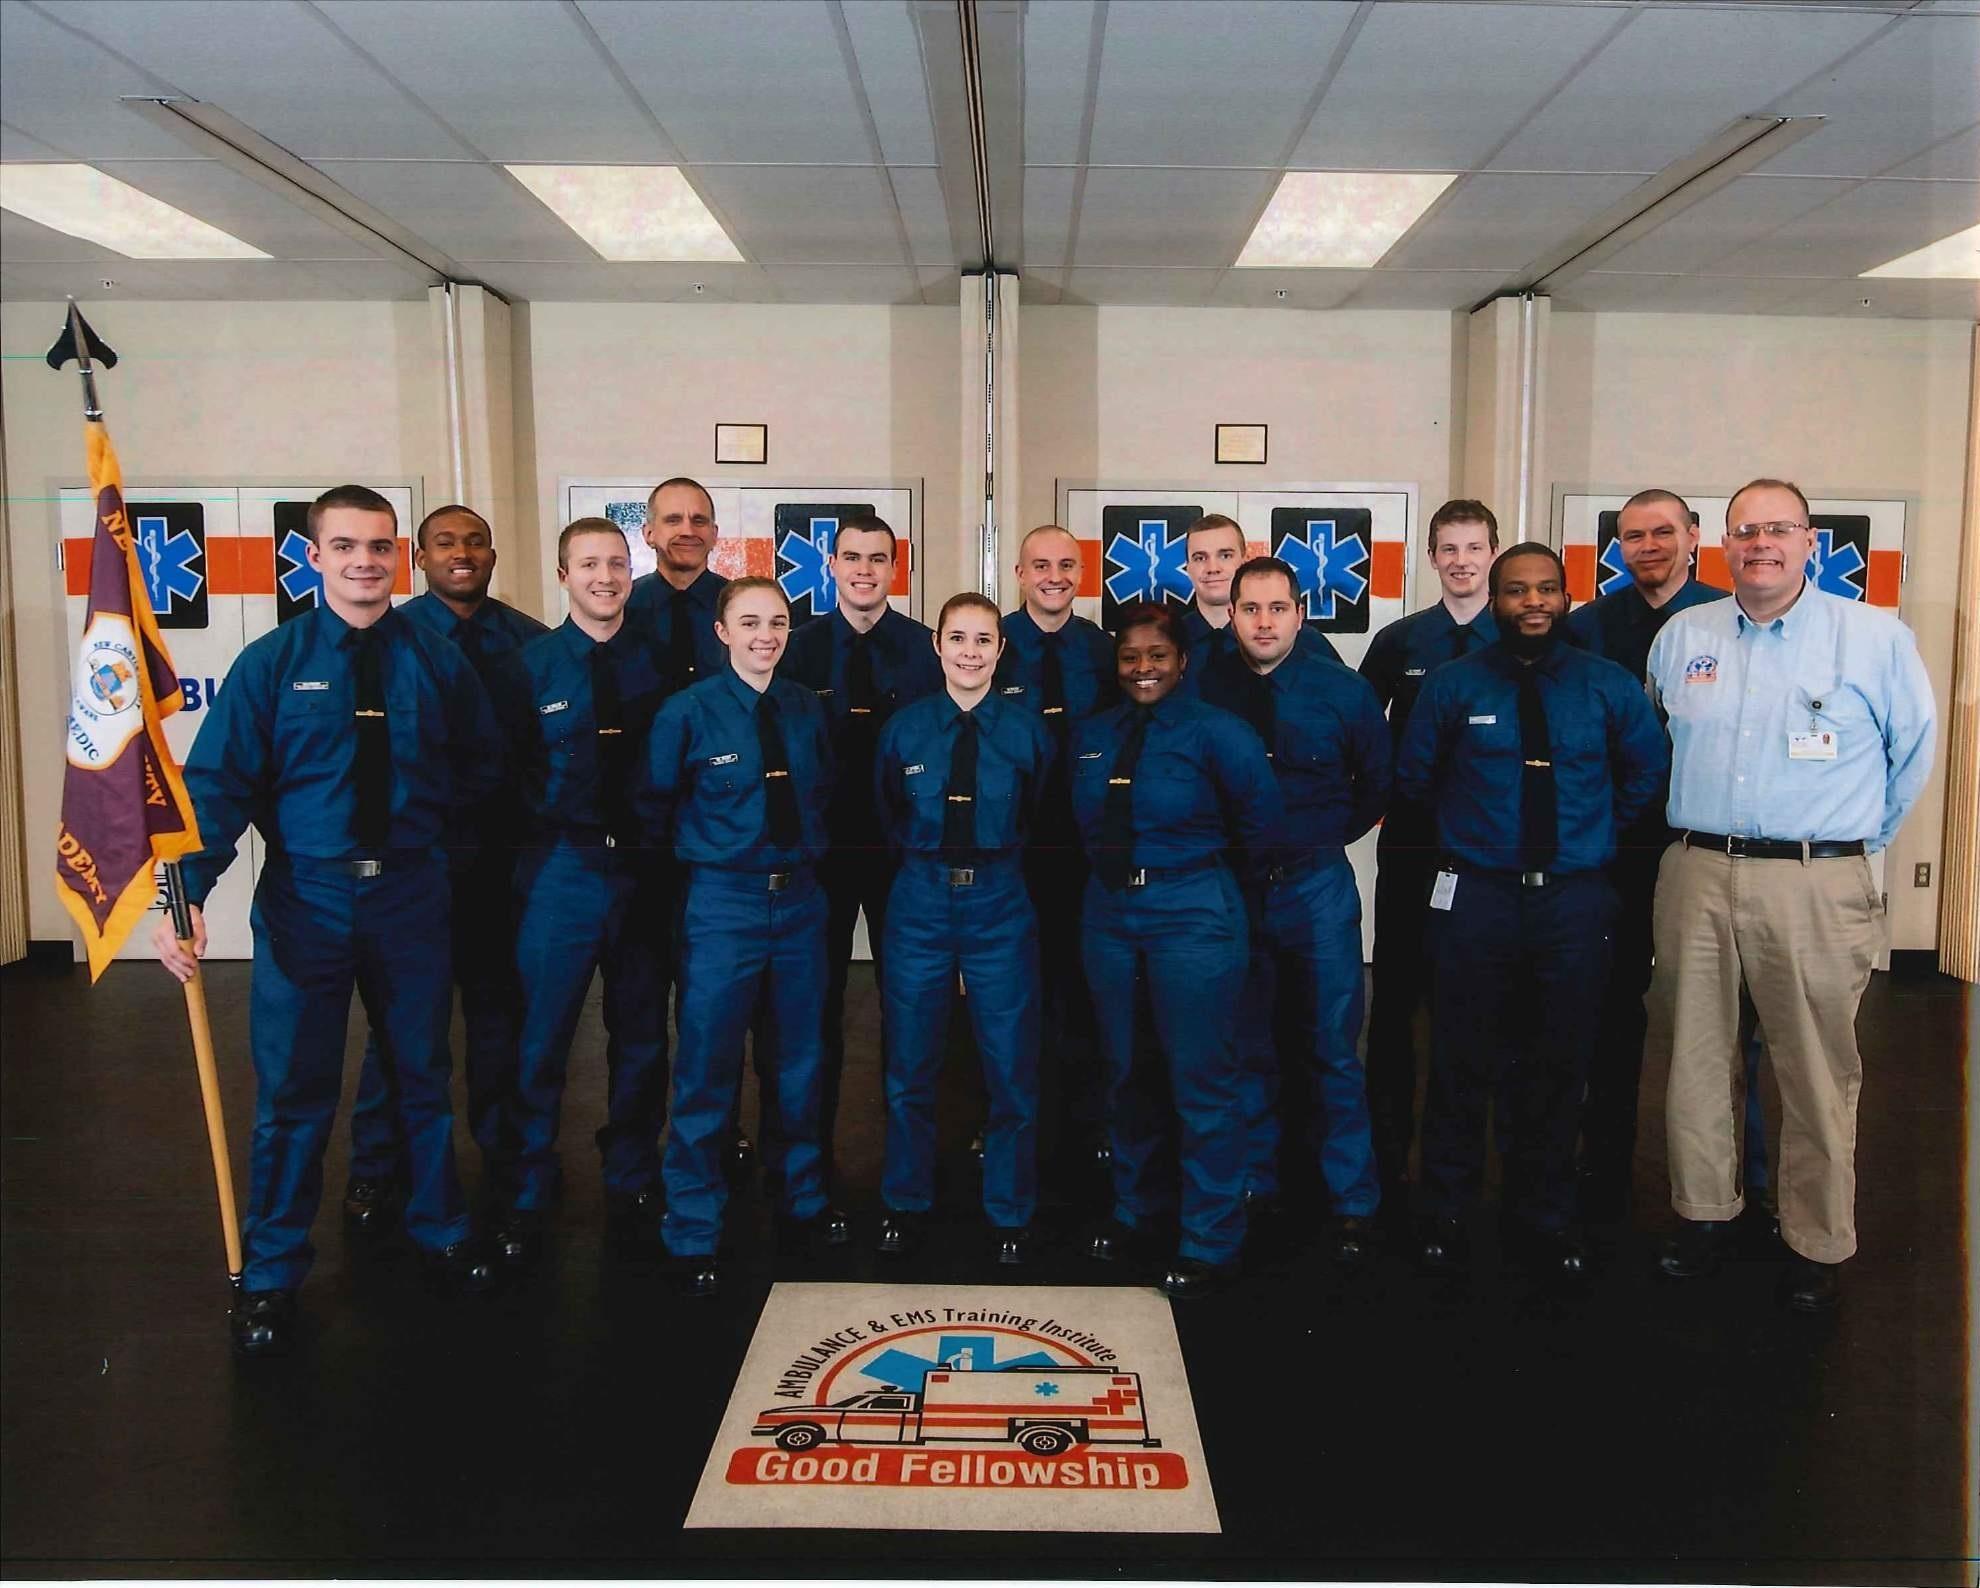 Good Fellowship Ambulance Ems Training Institute